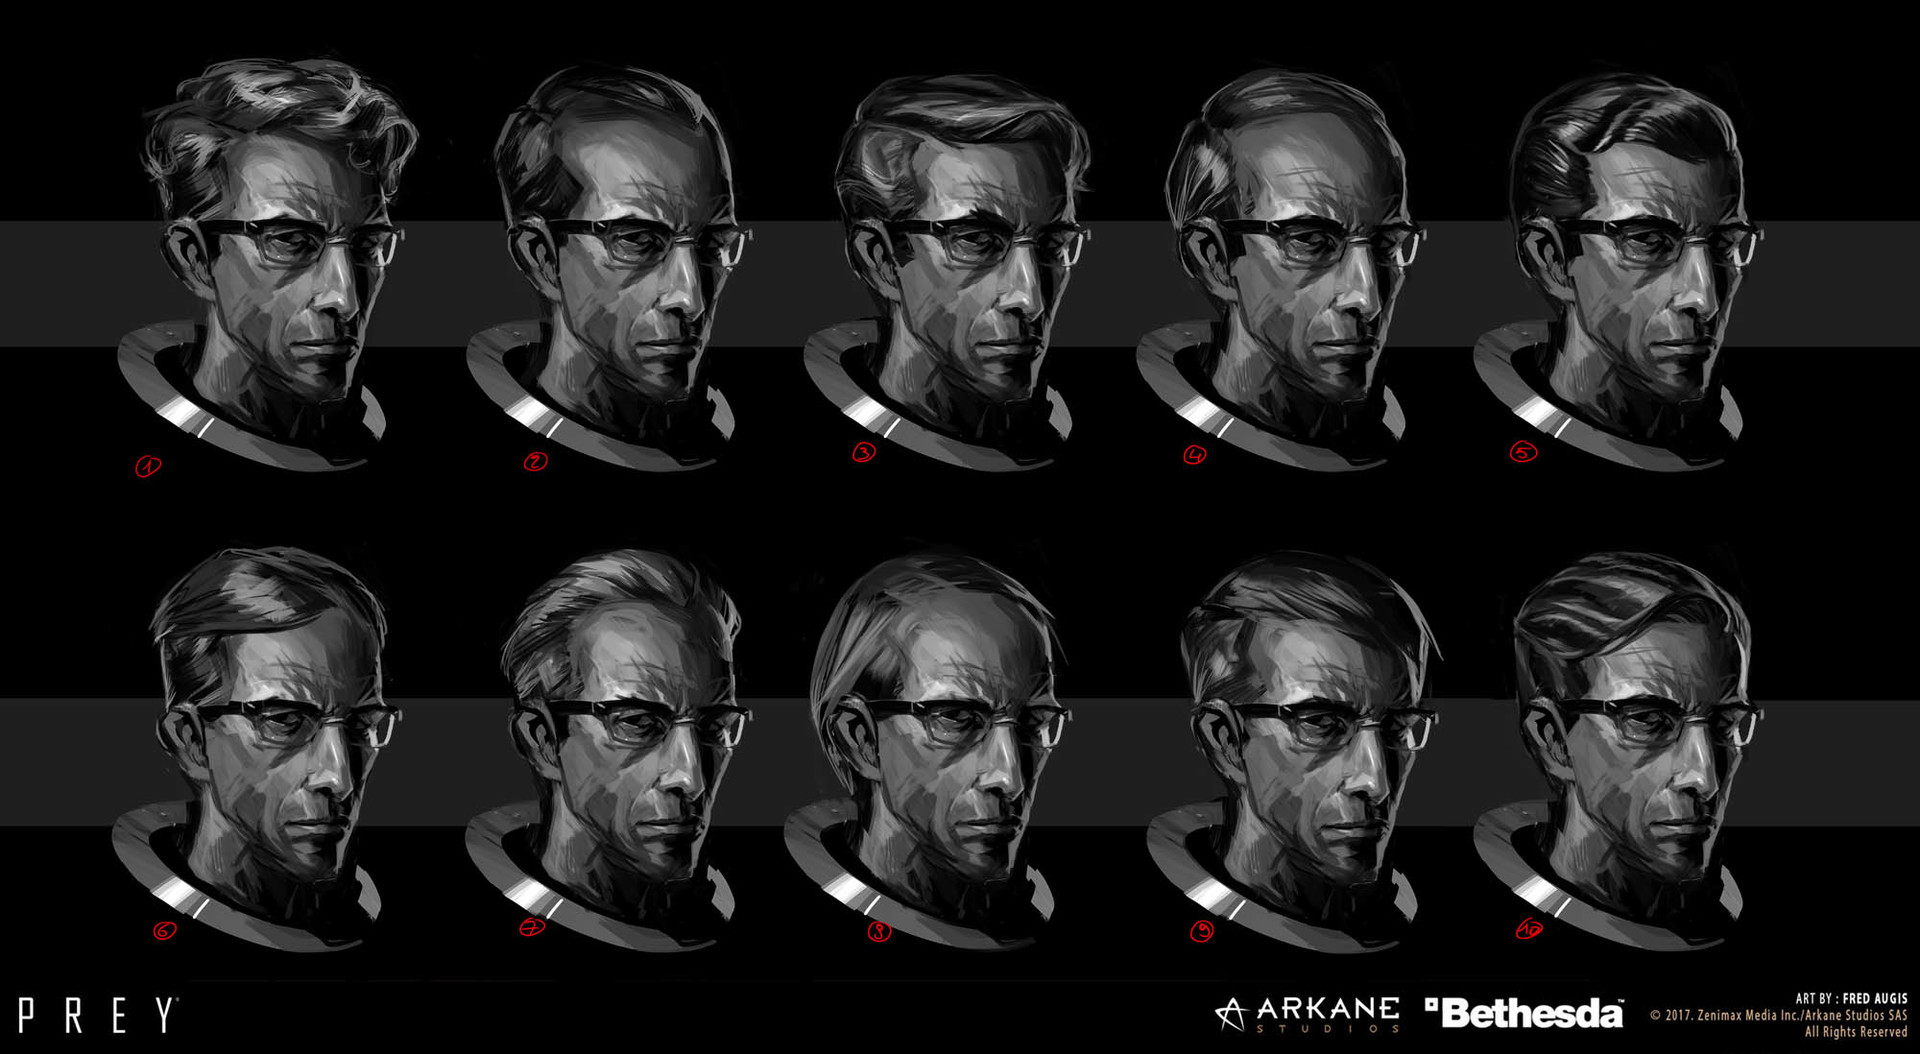 Fred augis portraits 10